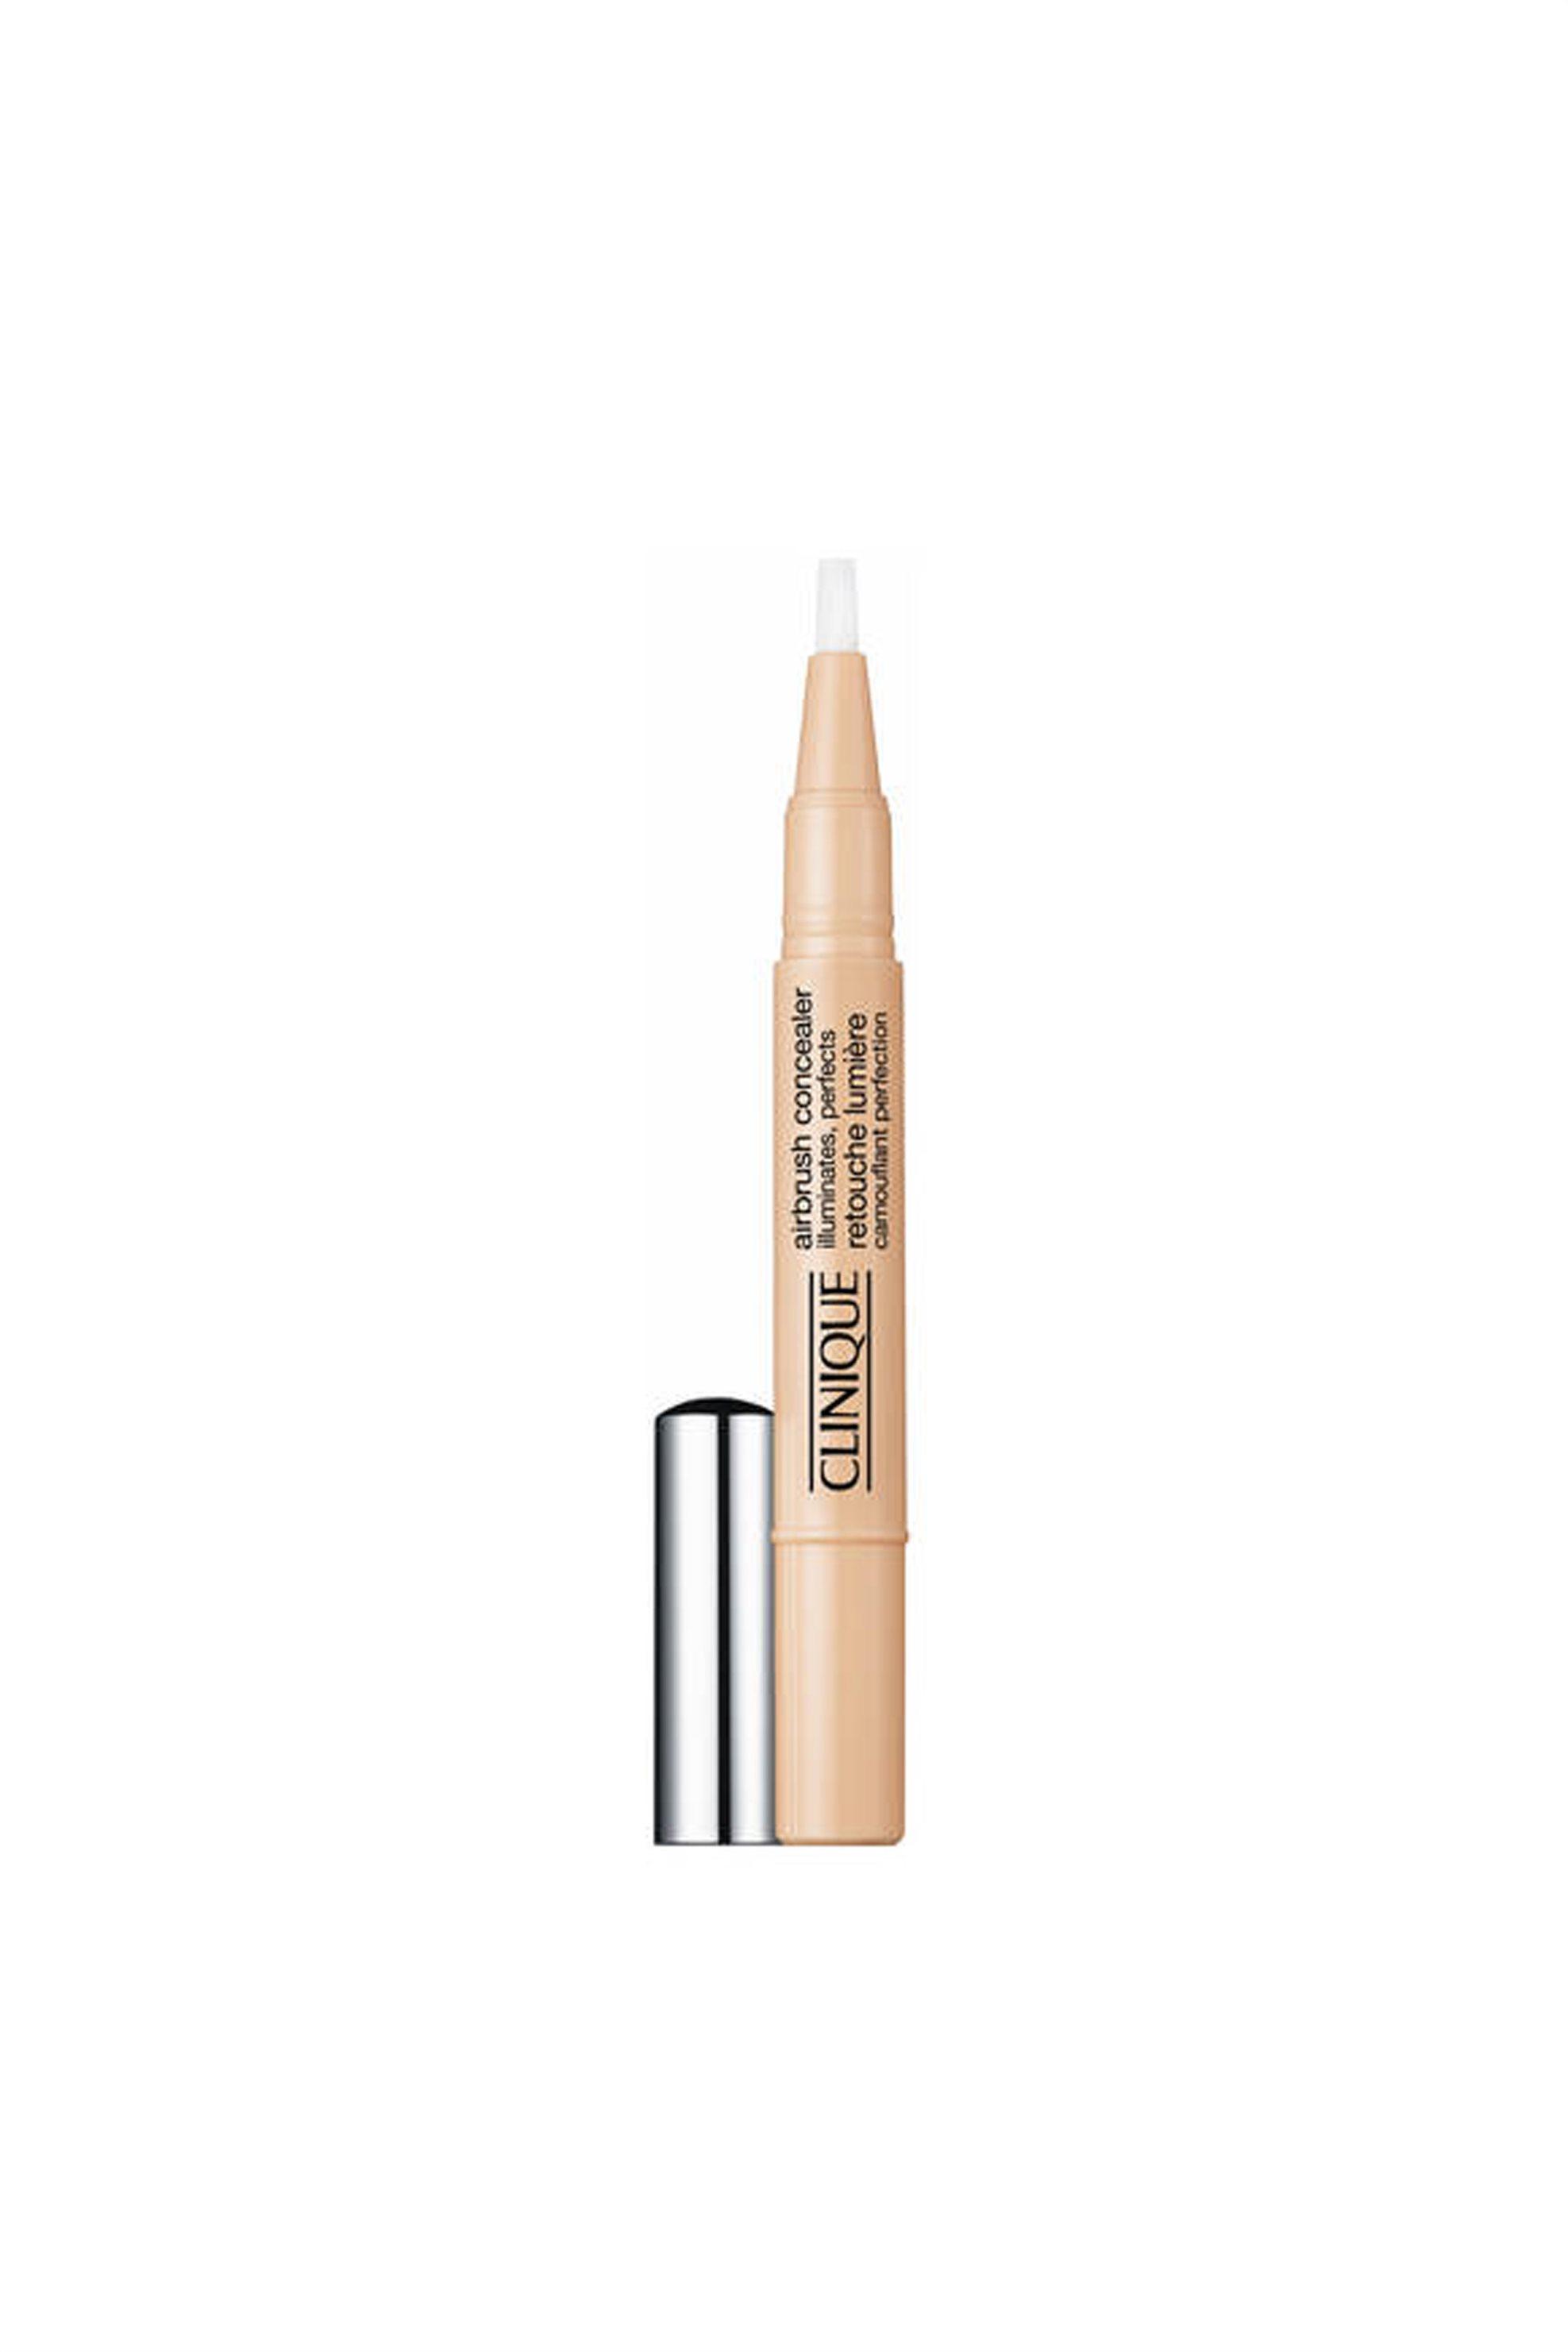 Clinique Airbrush Concealer™ 04 Neutral Fair 1.5 ml - 6CM2040000 ομορφια   καλλυντικα επιλεκτικησ   μακιγιάζ   πρόσωπο   concealers